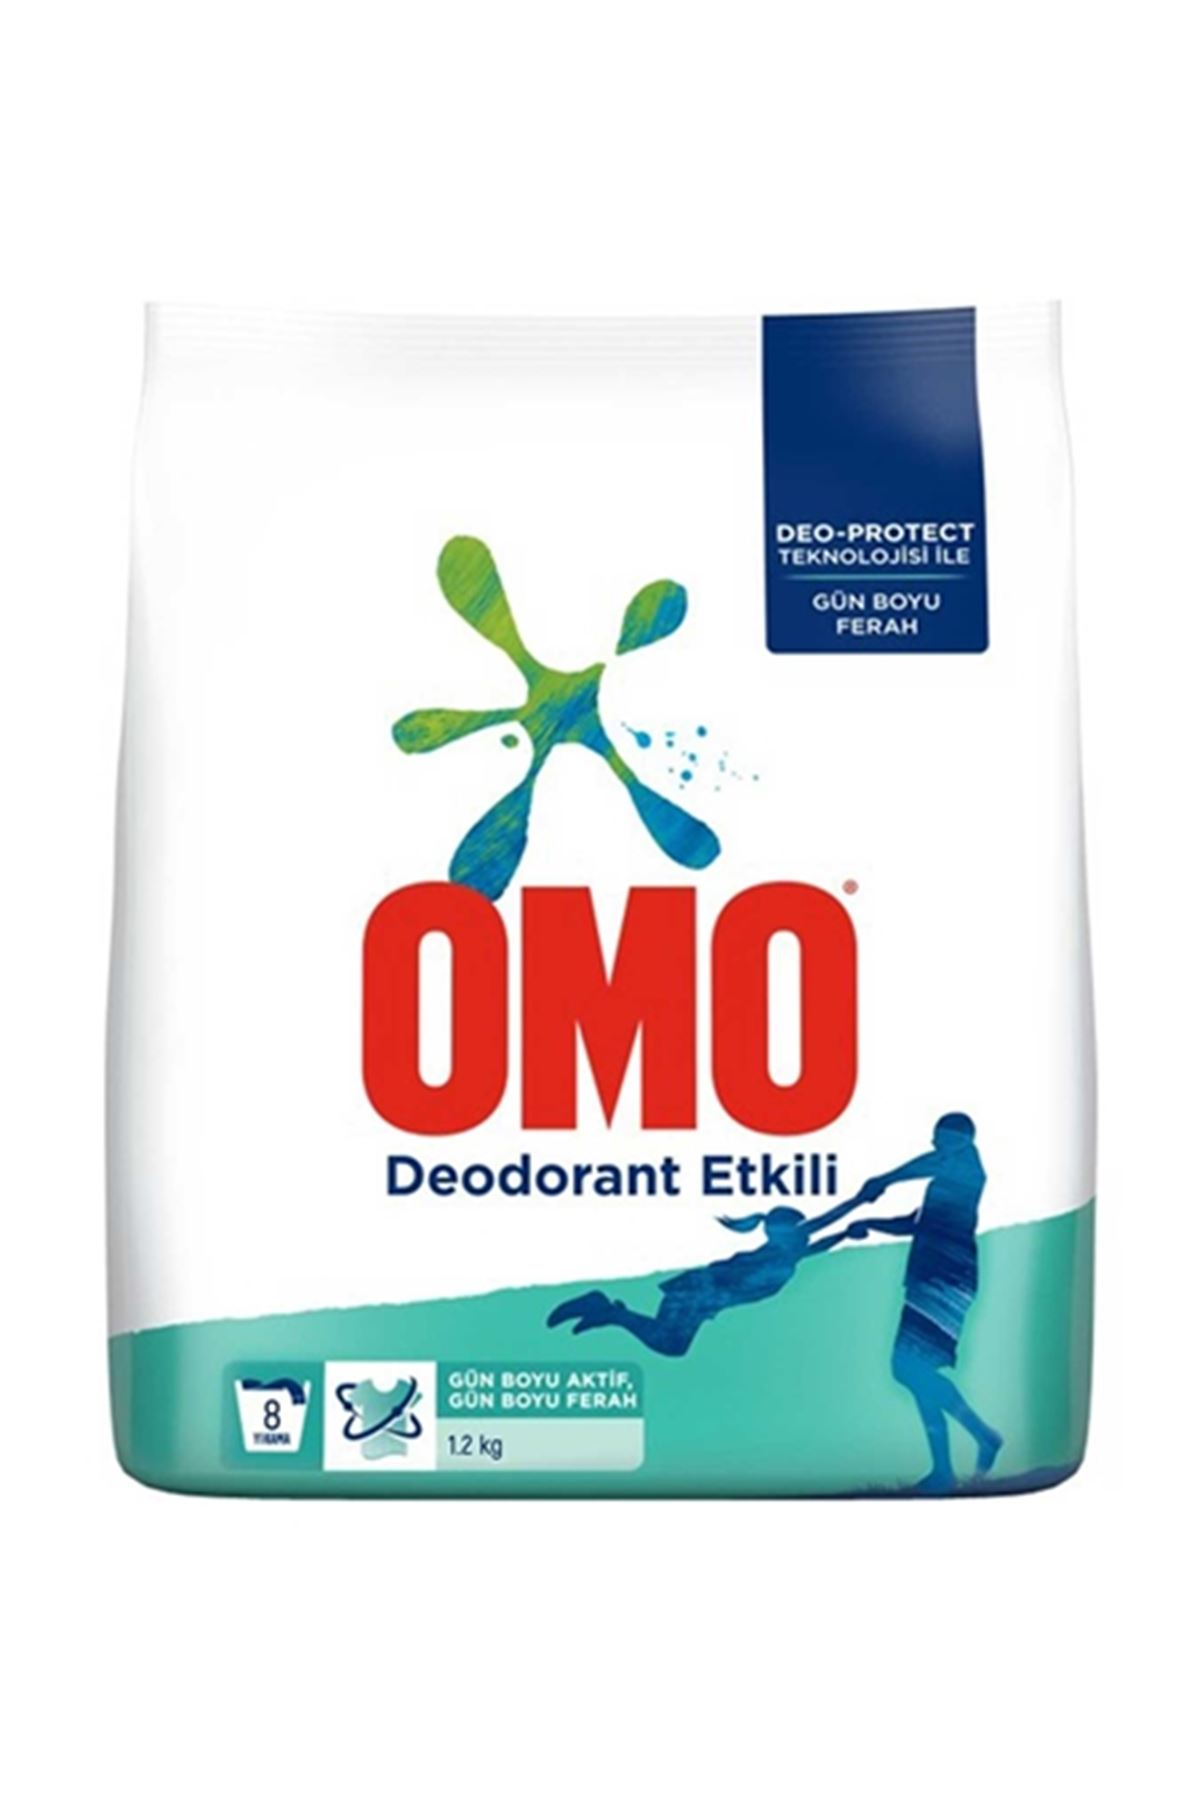 Omo Toz Deterjan Deodorant Etkili 1,2 KG